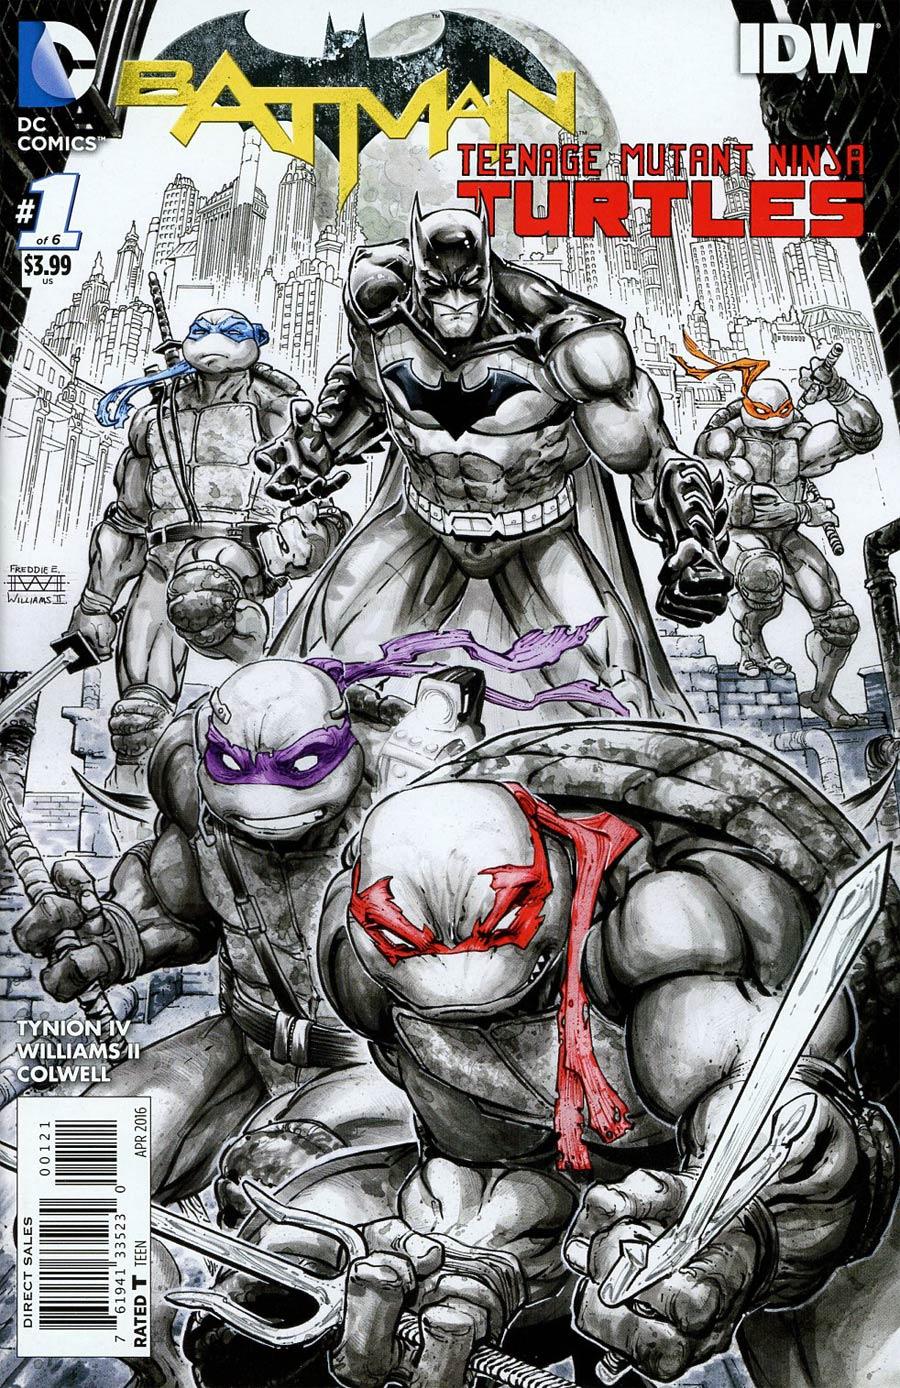 Batman Teenage Mutant Ninja Turtles #1 Cover M 2nd Ptg Freddie E Williams II Variant Cover